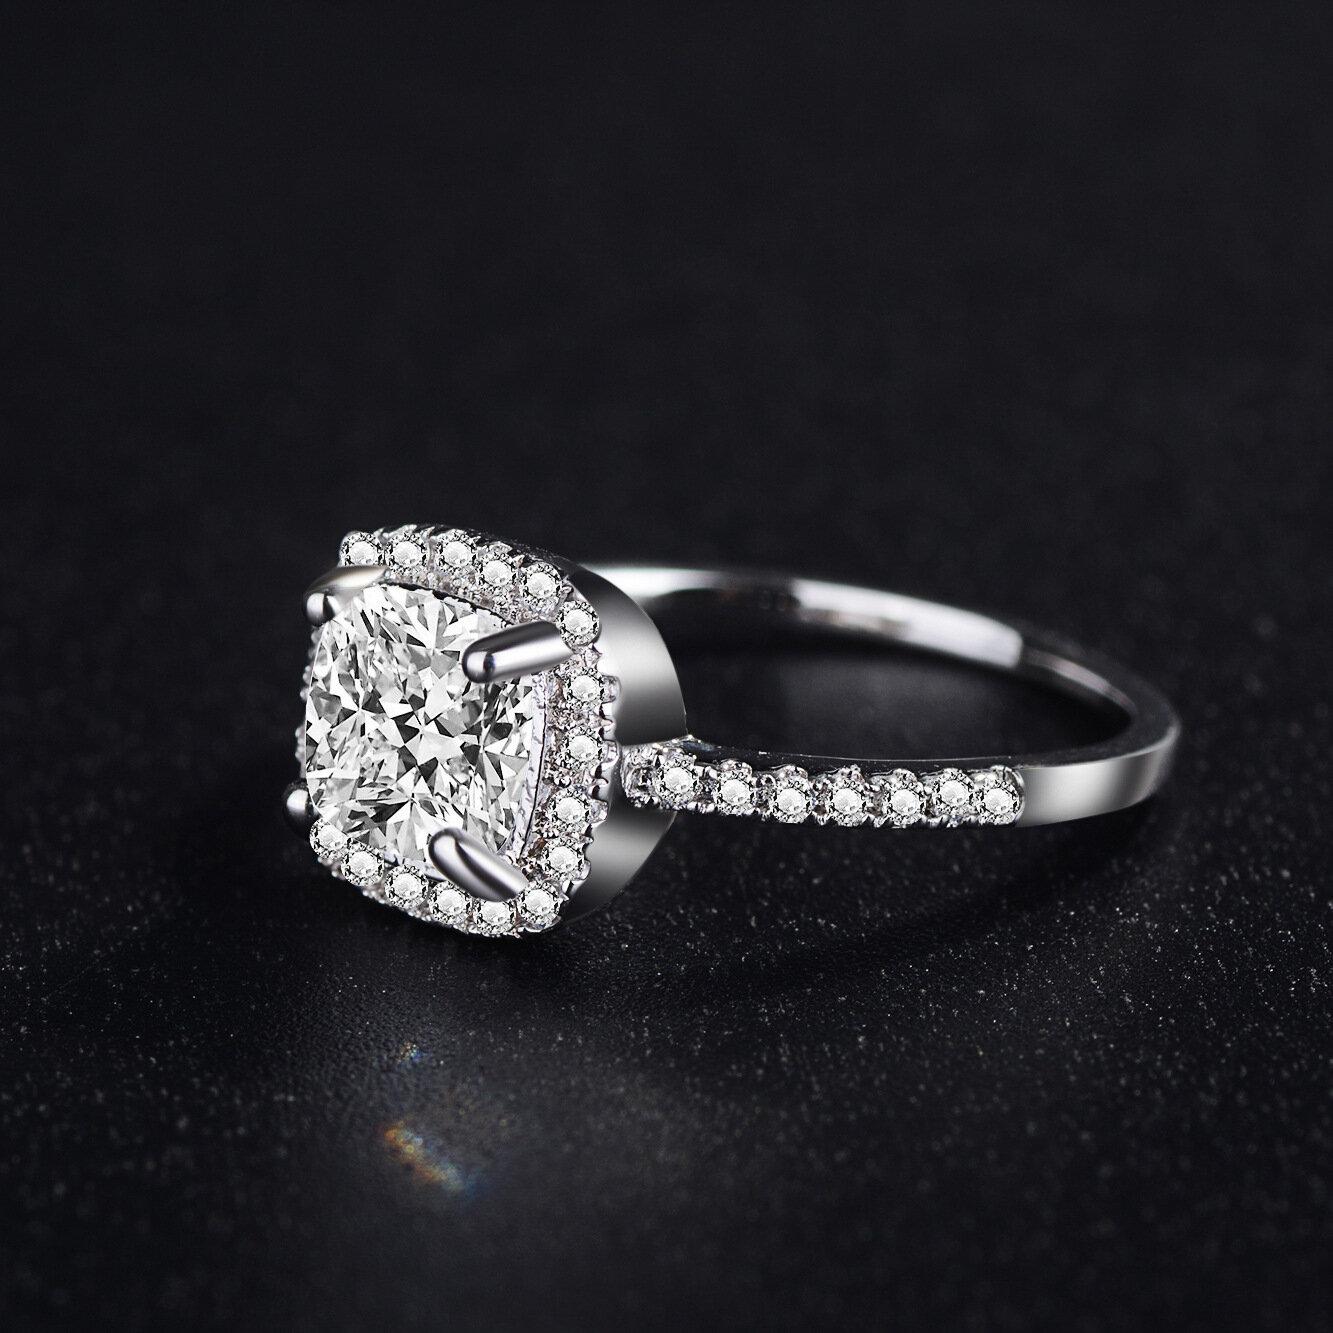 Fashion Rings Show Elegant Temperament Jewelry